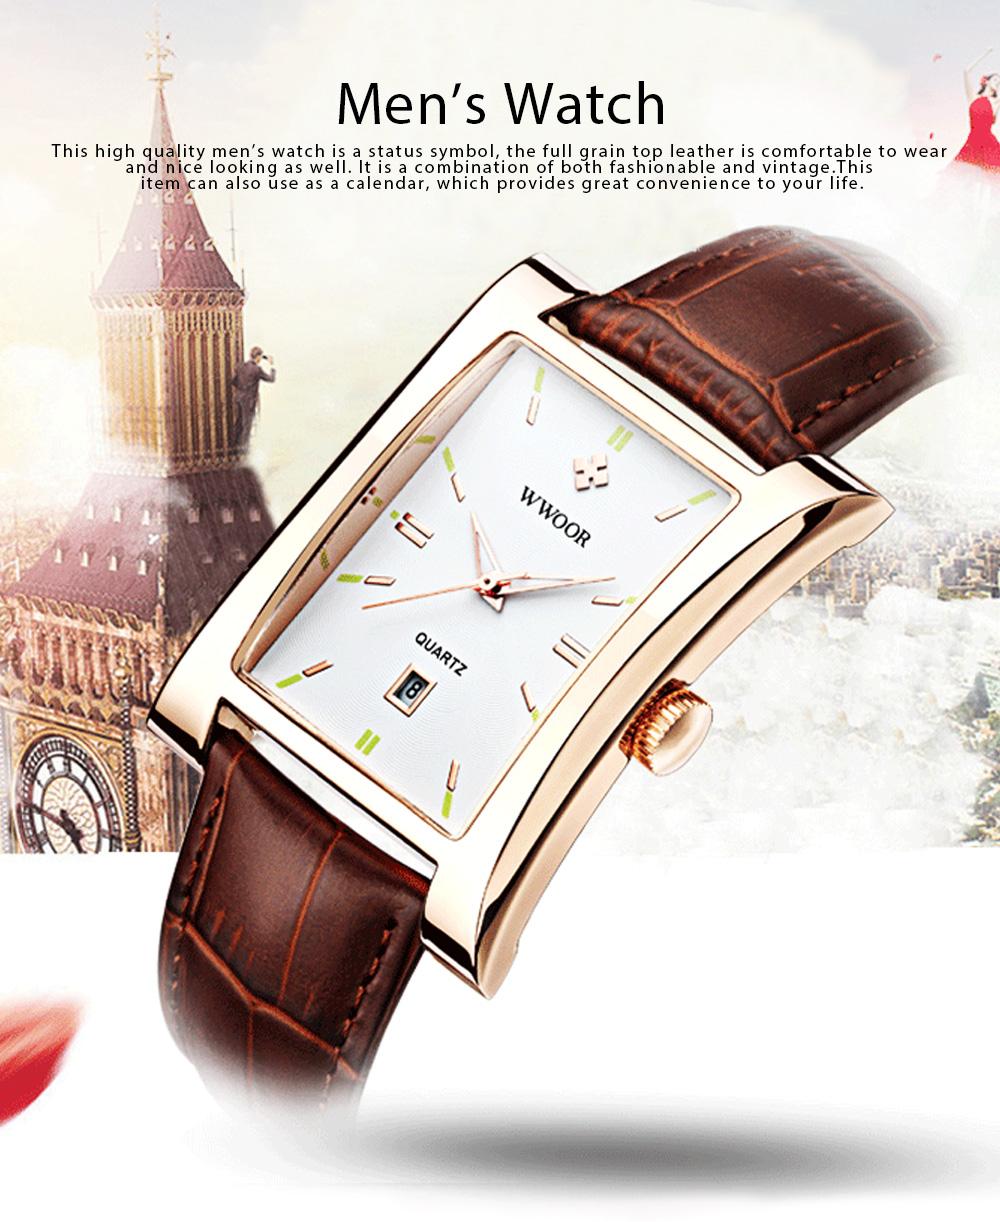 Luxury Wrist Watch for Men, High Quality Leather Strap Watch with Calendar, Waterproof Men's Watch 0